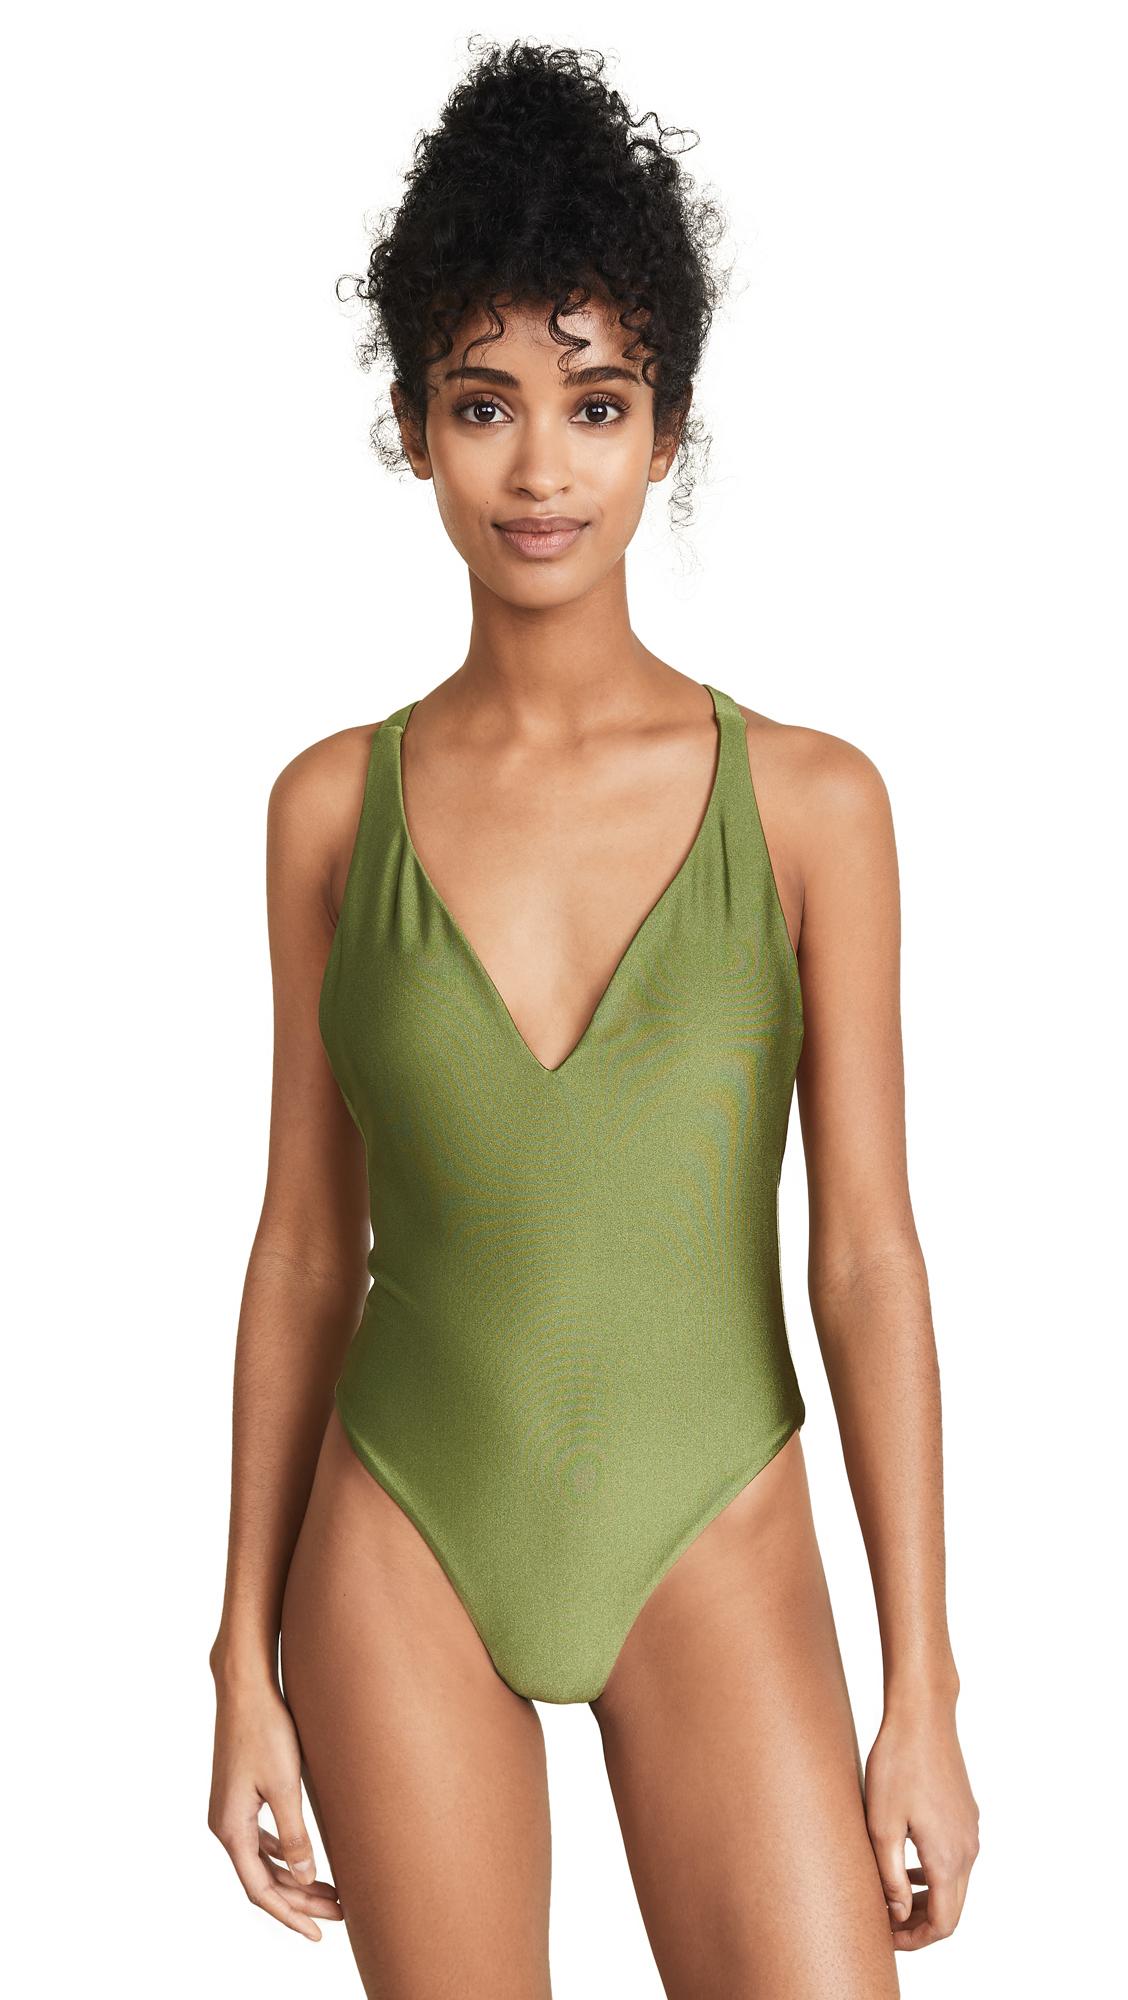 JADE SWIM Revel One Piece Swimsuit in Eden